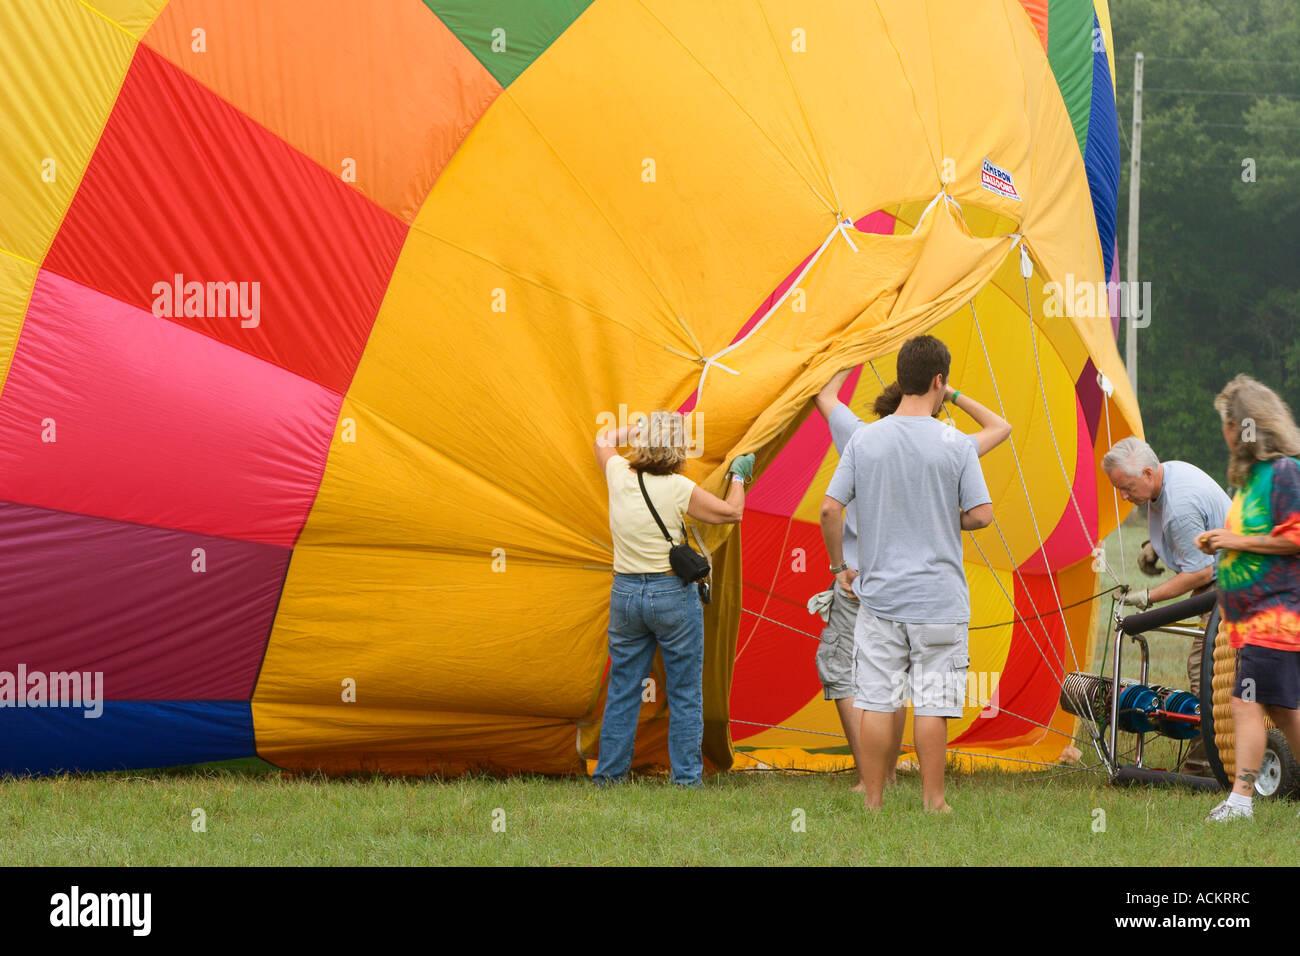 Yellow hot air balloon prepare for lift off at balloon festival in Dunnellon, Florida, USA Stock Photo